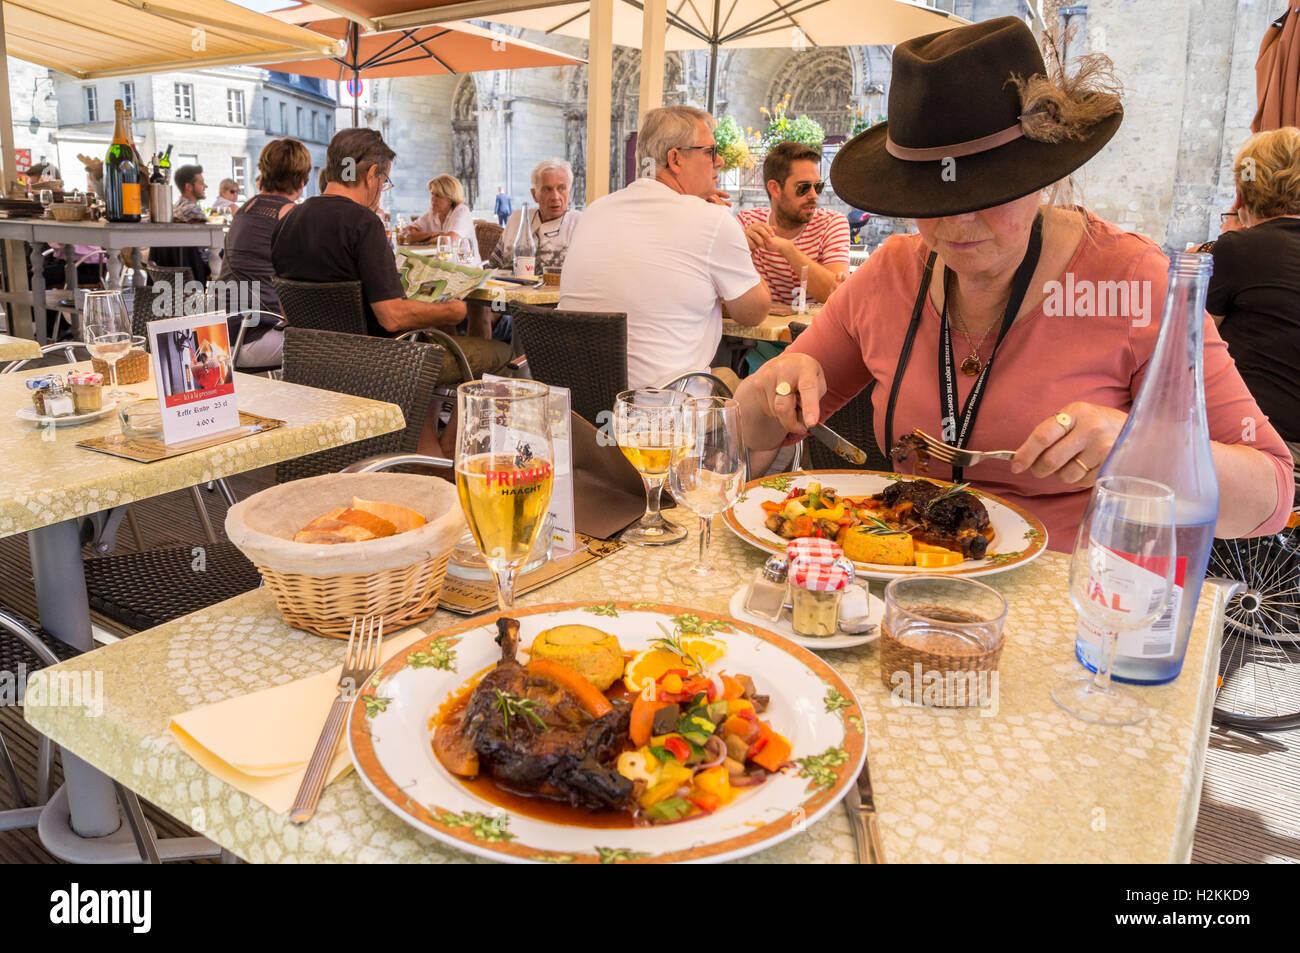 a-woman-eating-canard-lorange-le-parvis-brasserie-restaurant-laon-H2KKD9.jpg